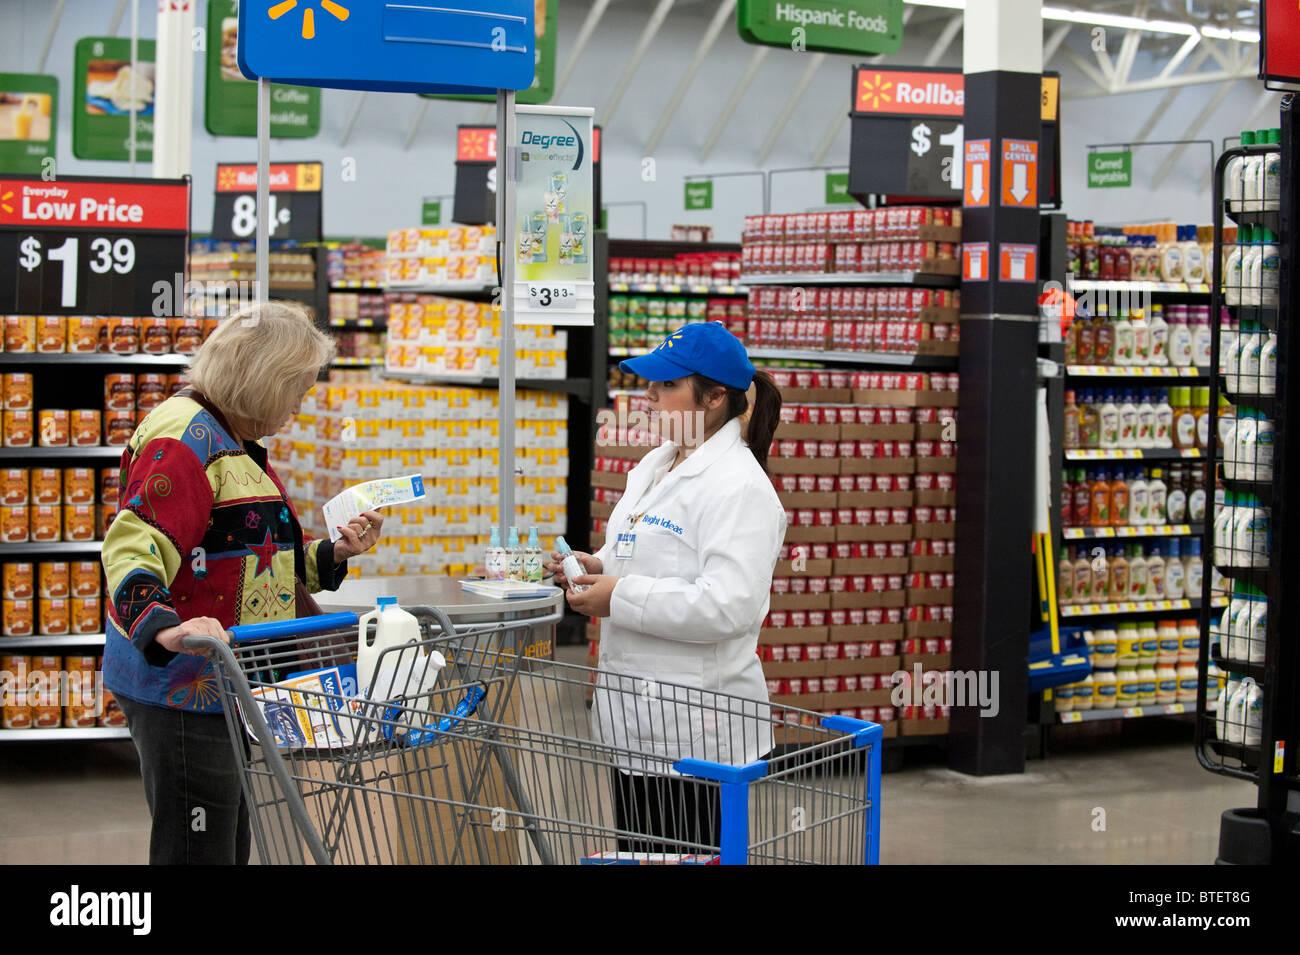 Walmart Store Display Stock Photos Amp Walmart Store Display